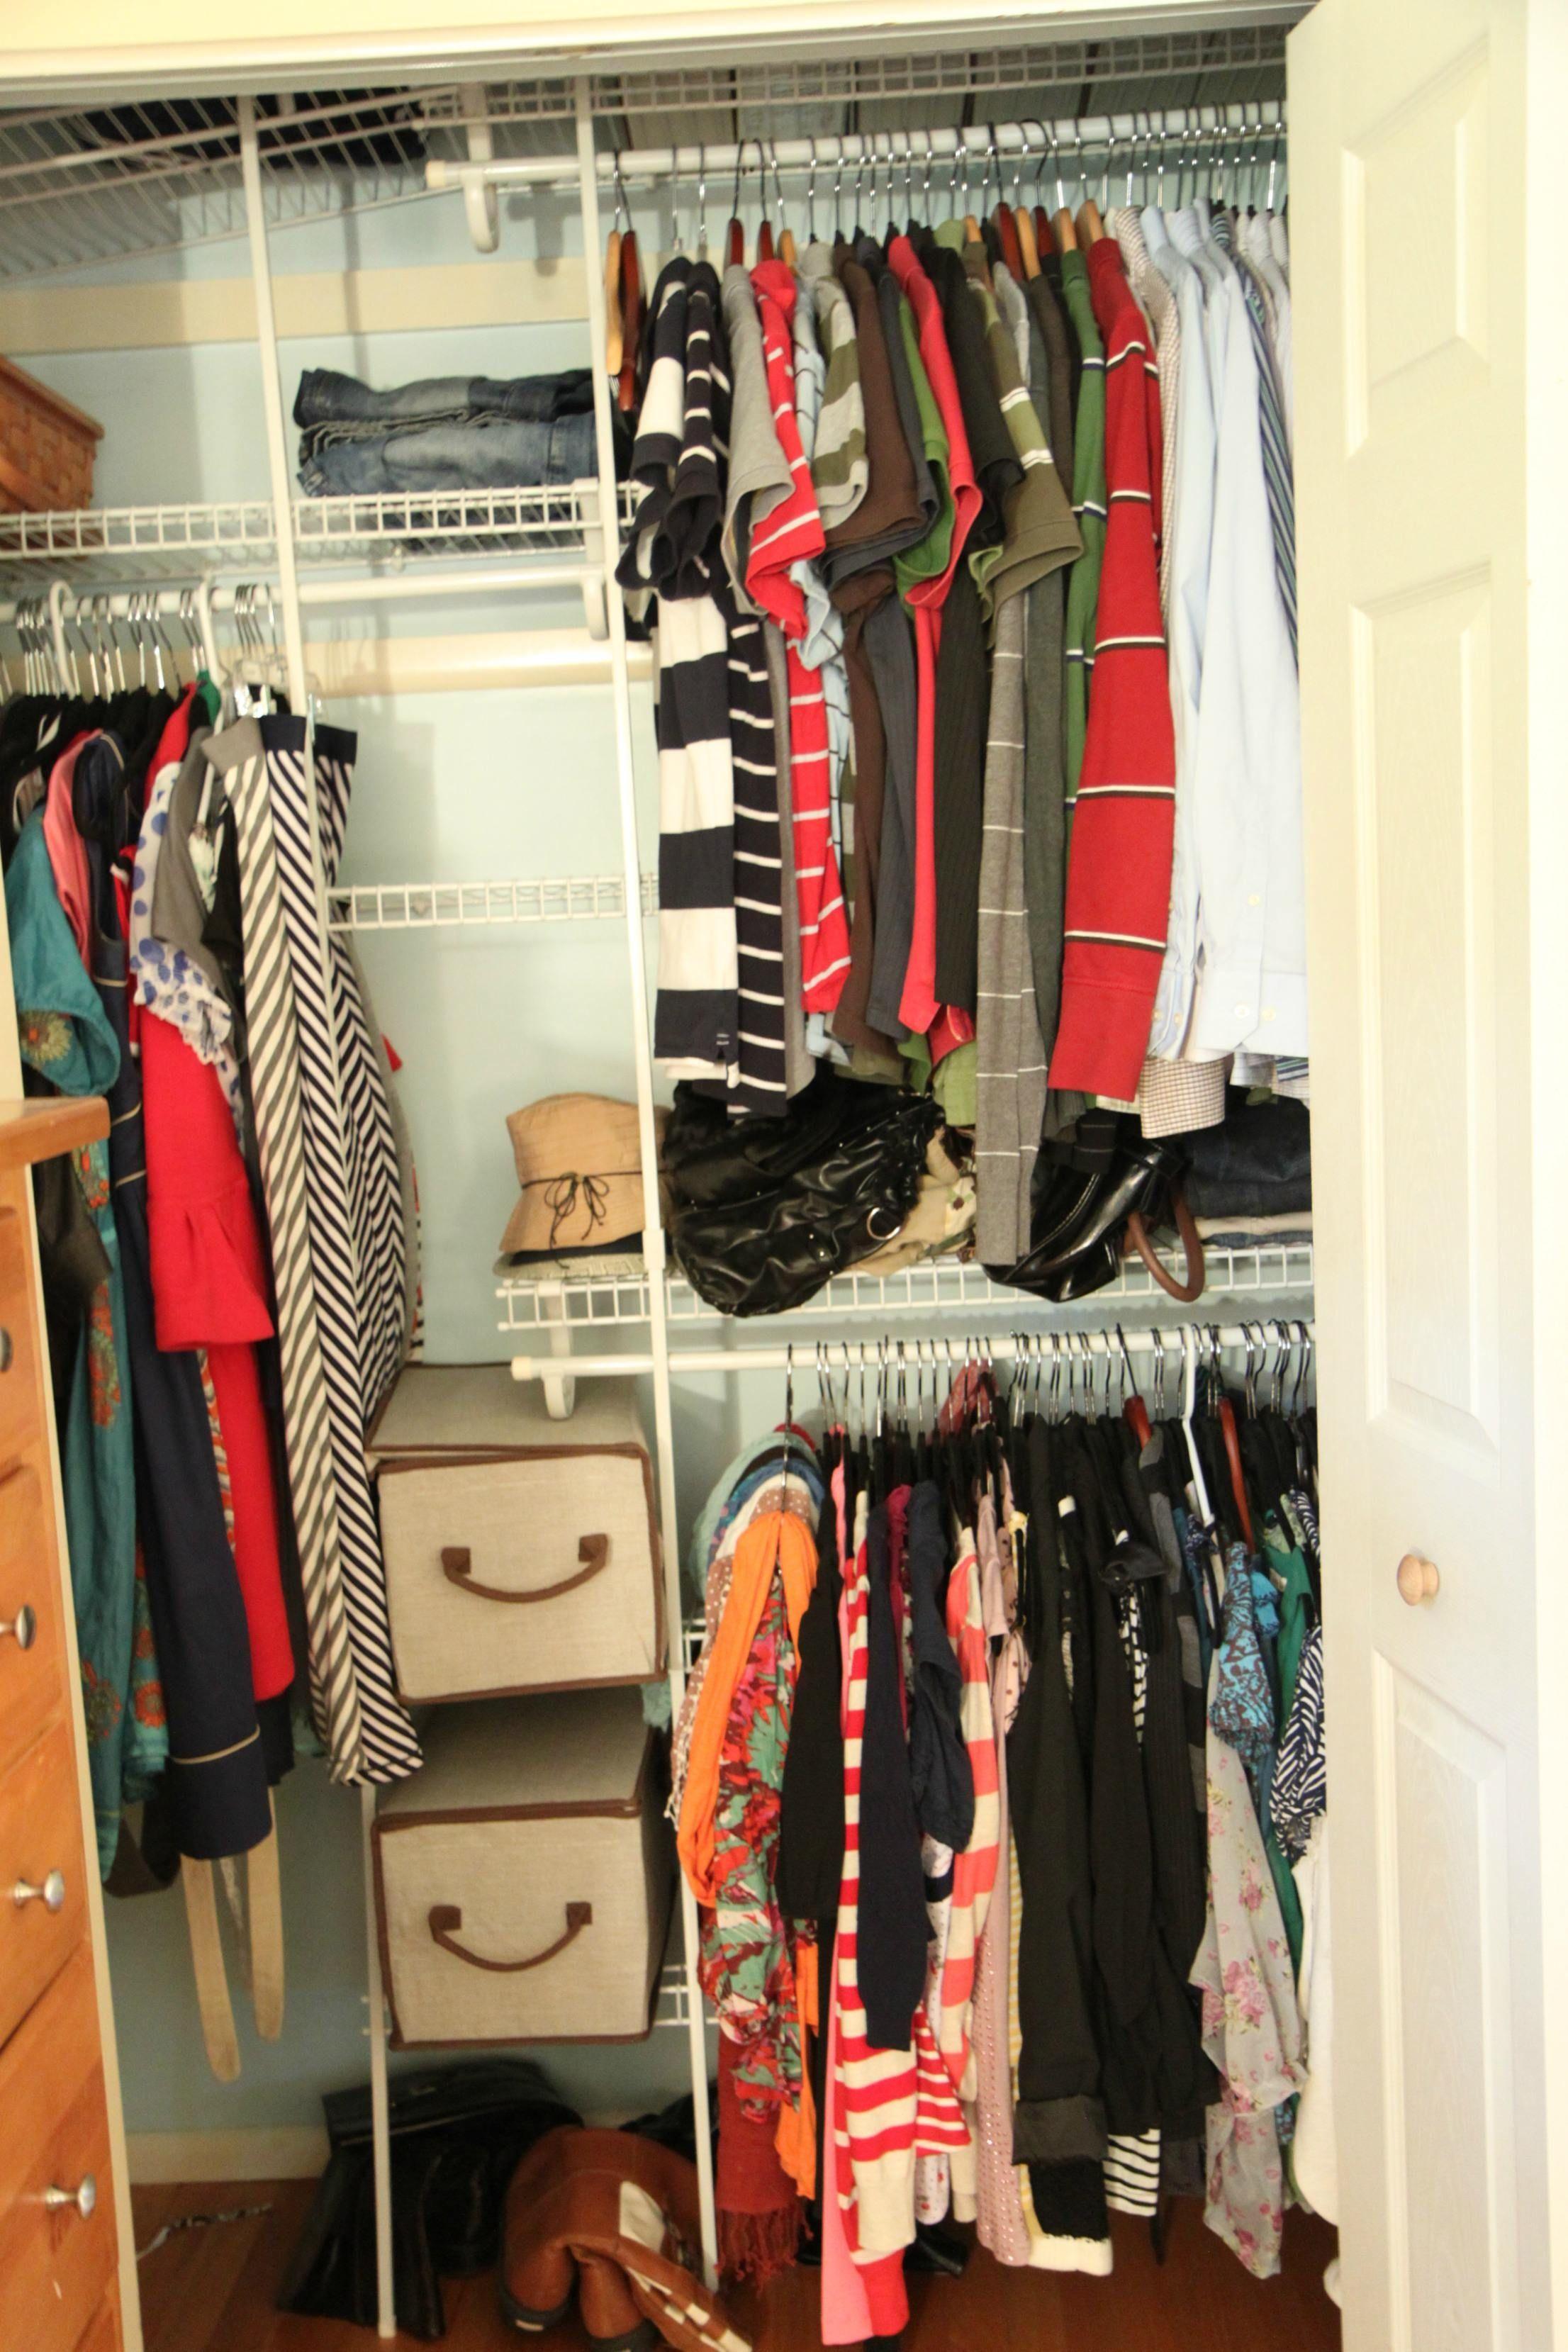 Delightful Organization For Tiny Closets